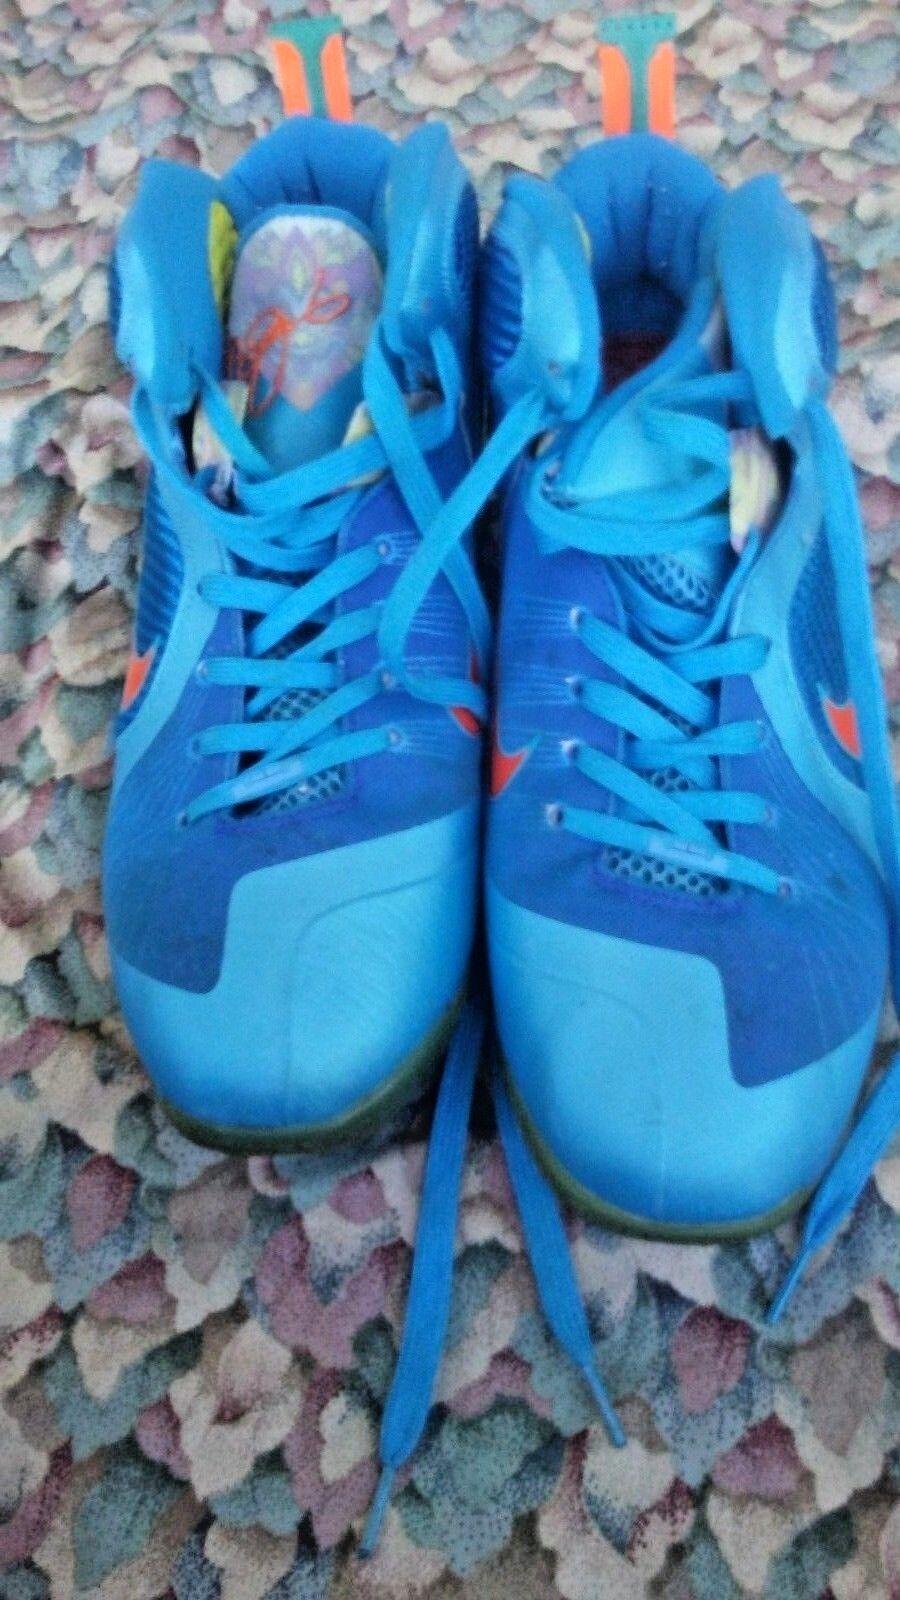 NIKE LeBron   2018 469764-800 Shoes Sneakers  Size 12  Men Blue